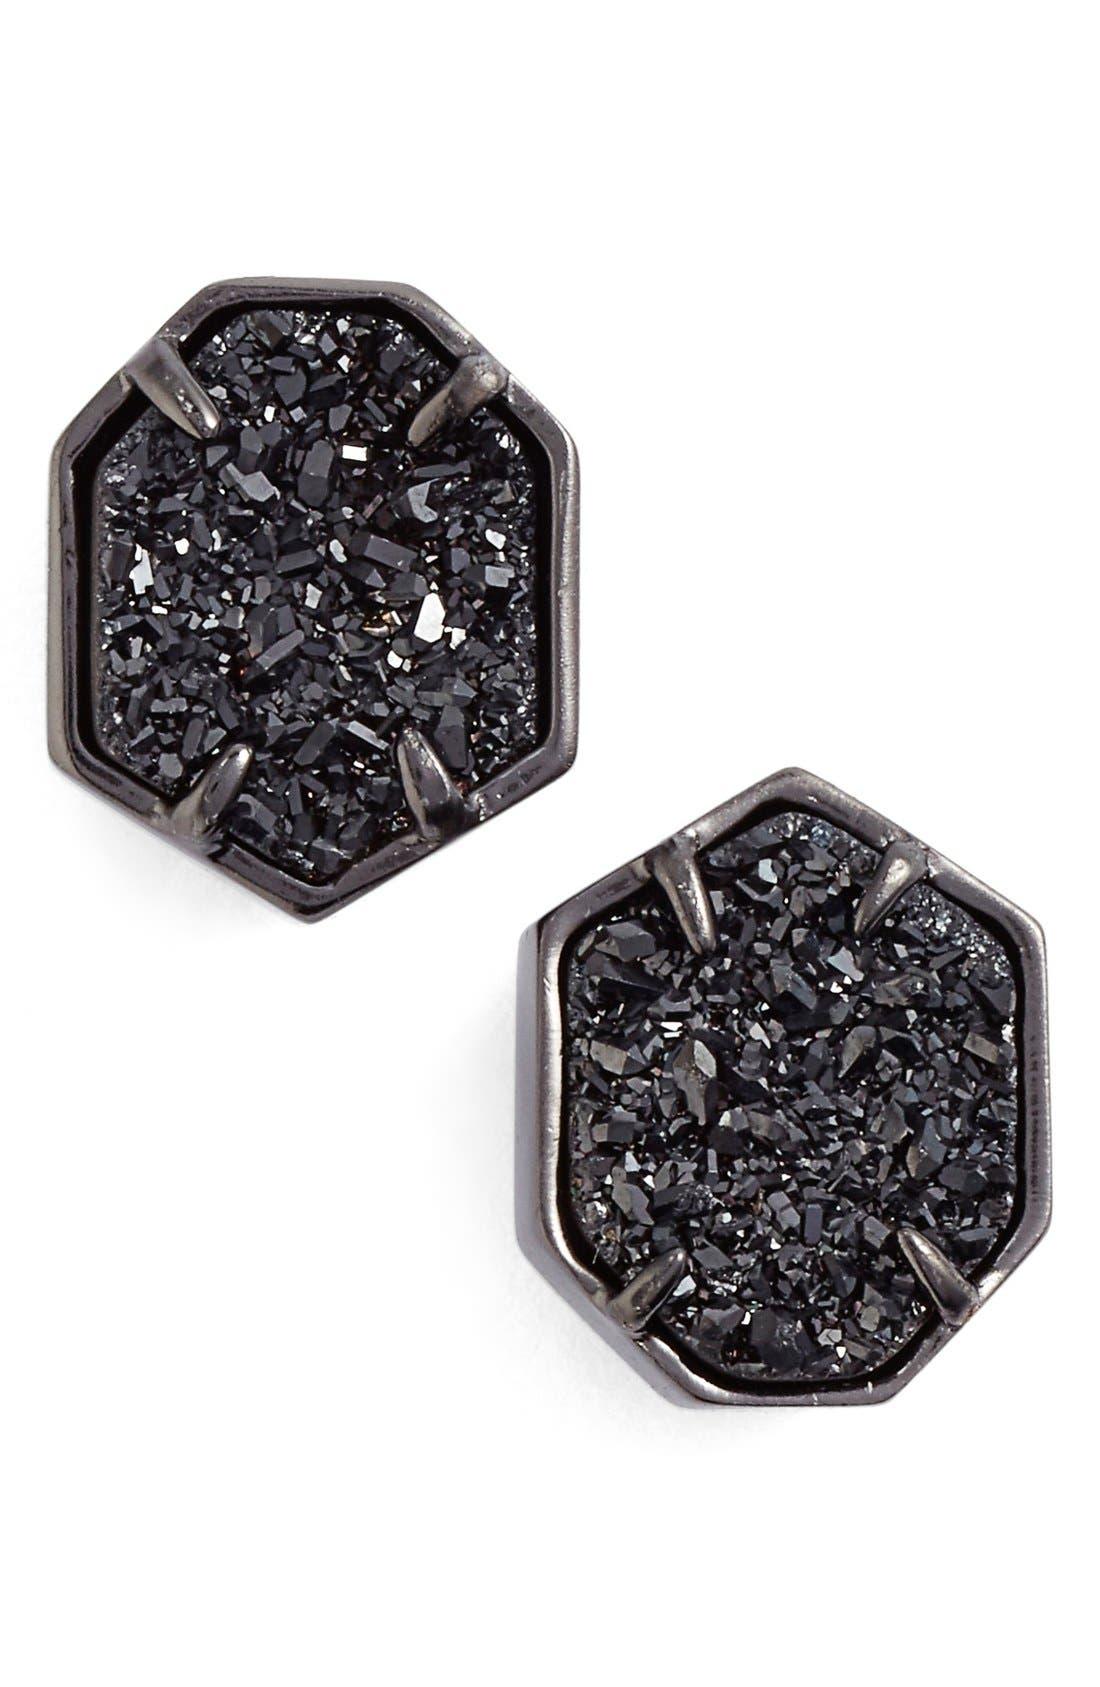 Alternate Image 1 Selected - Kendra Scott 'Taylor' Stud Earrings